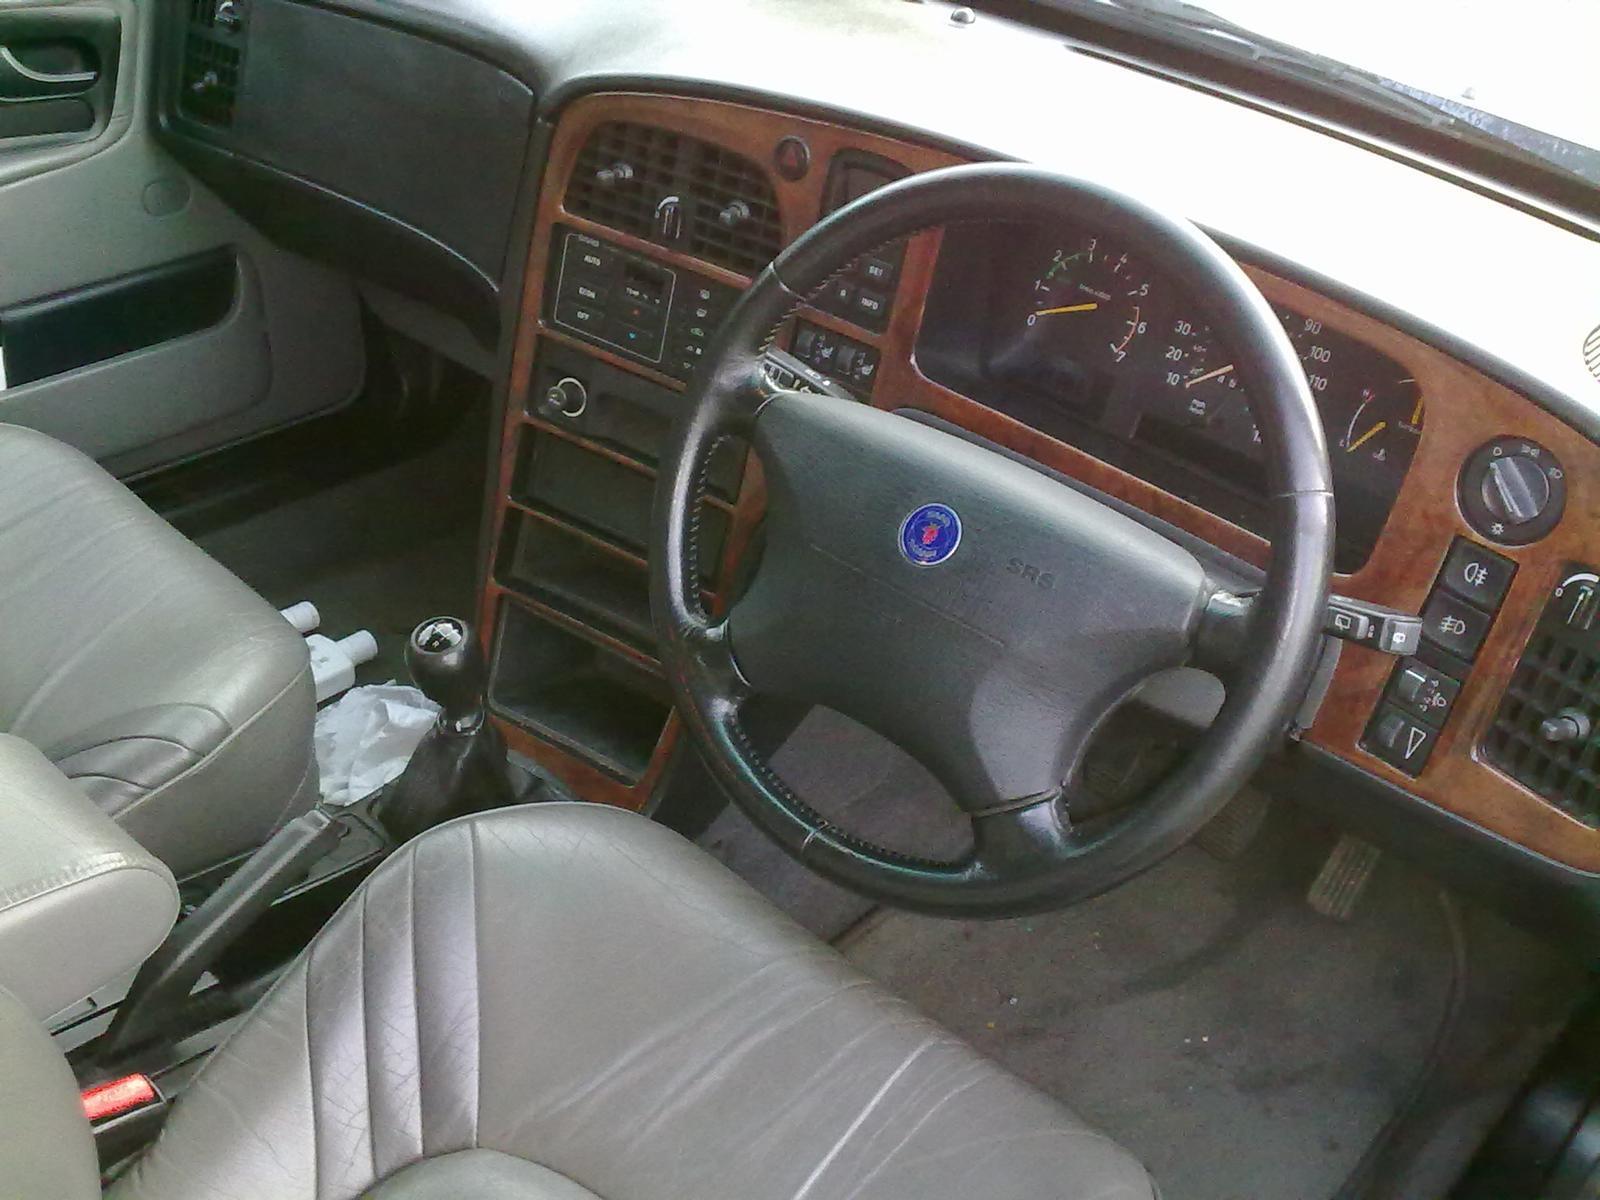 800 1024 1280 1600 origin 1996 Saab 9000 ...